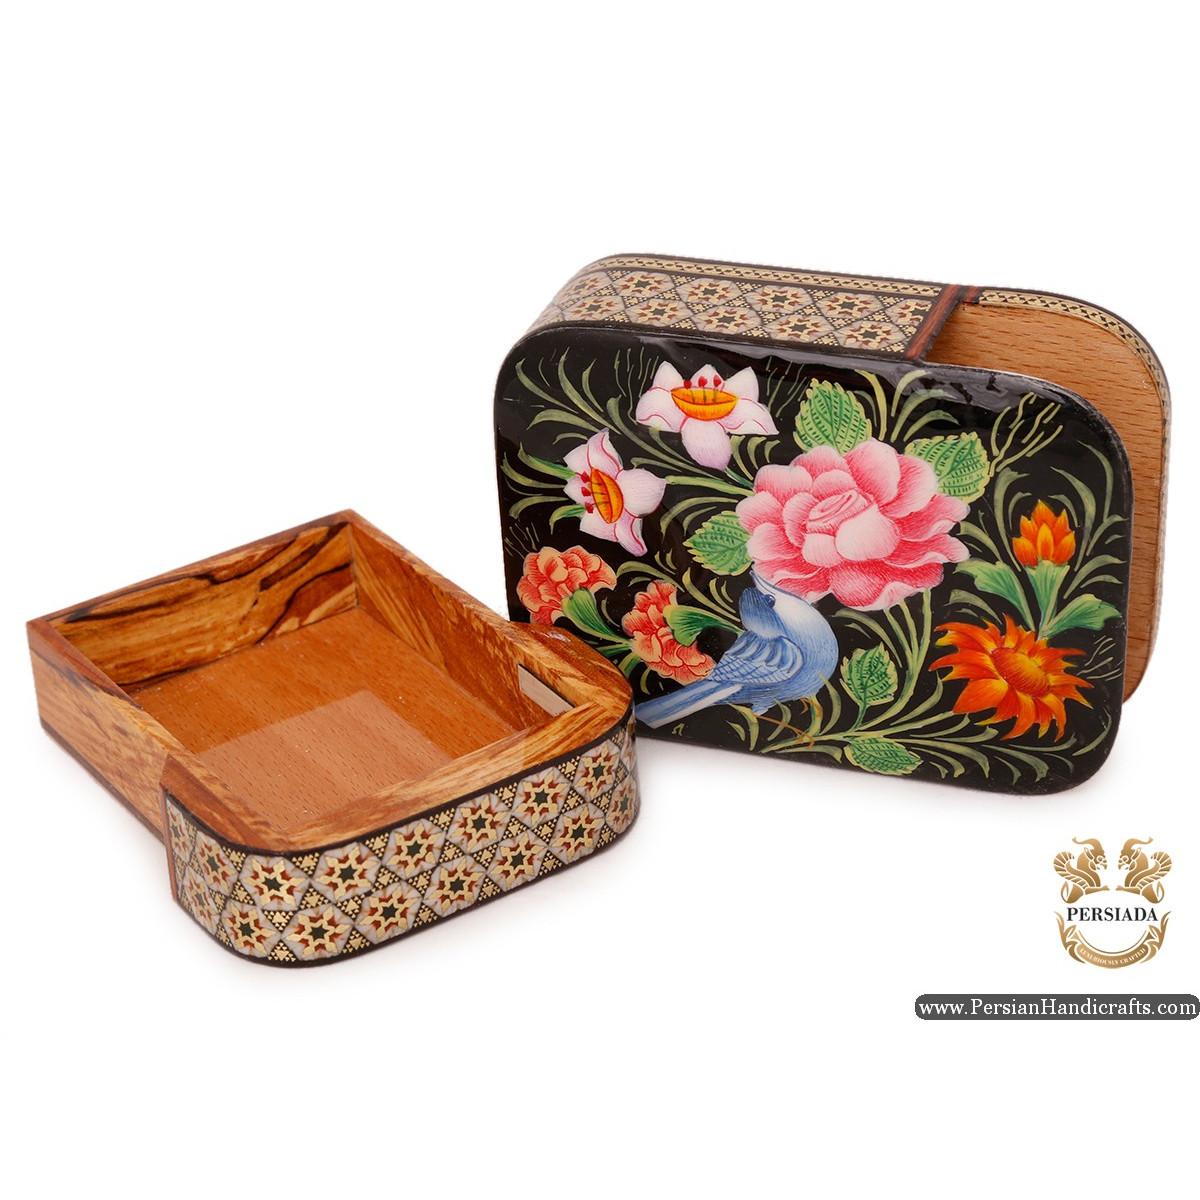 Slide in Box   Miniature Khatam Marquetry   Persiada HKH6106